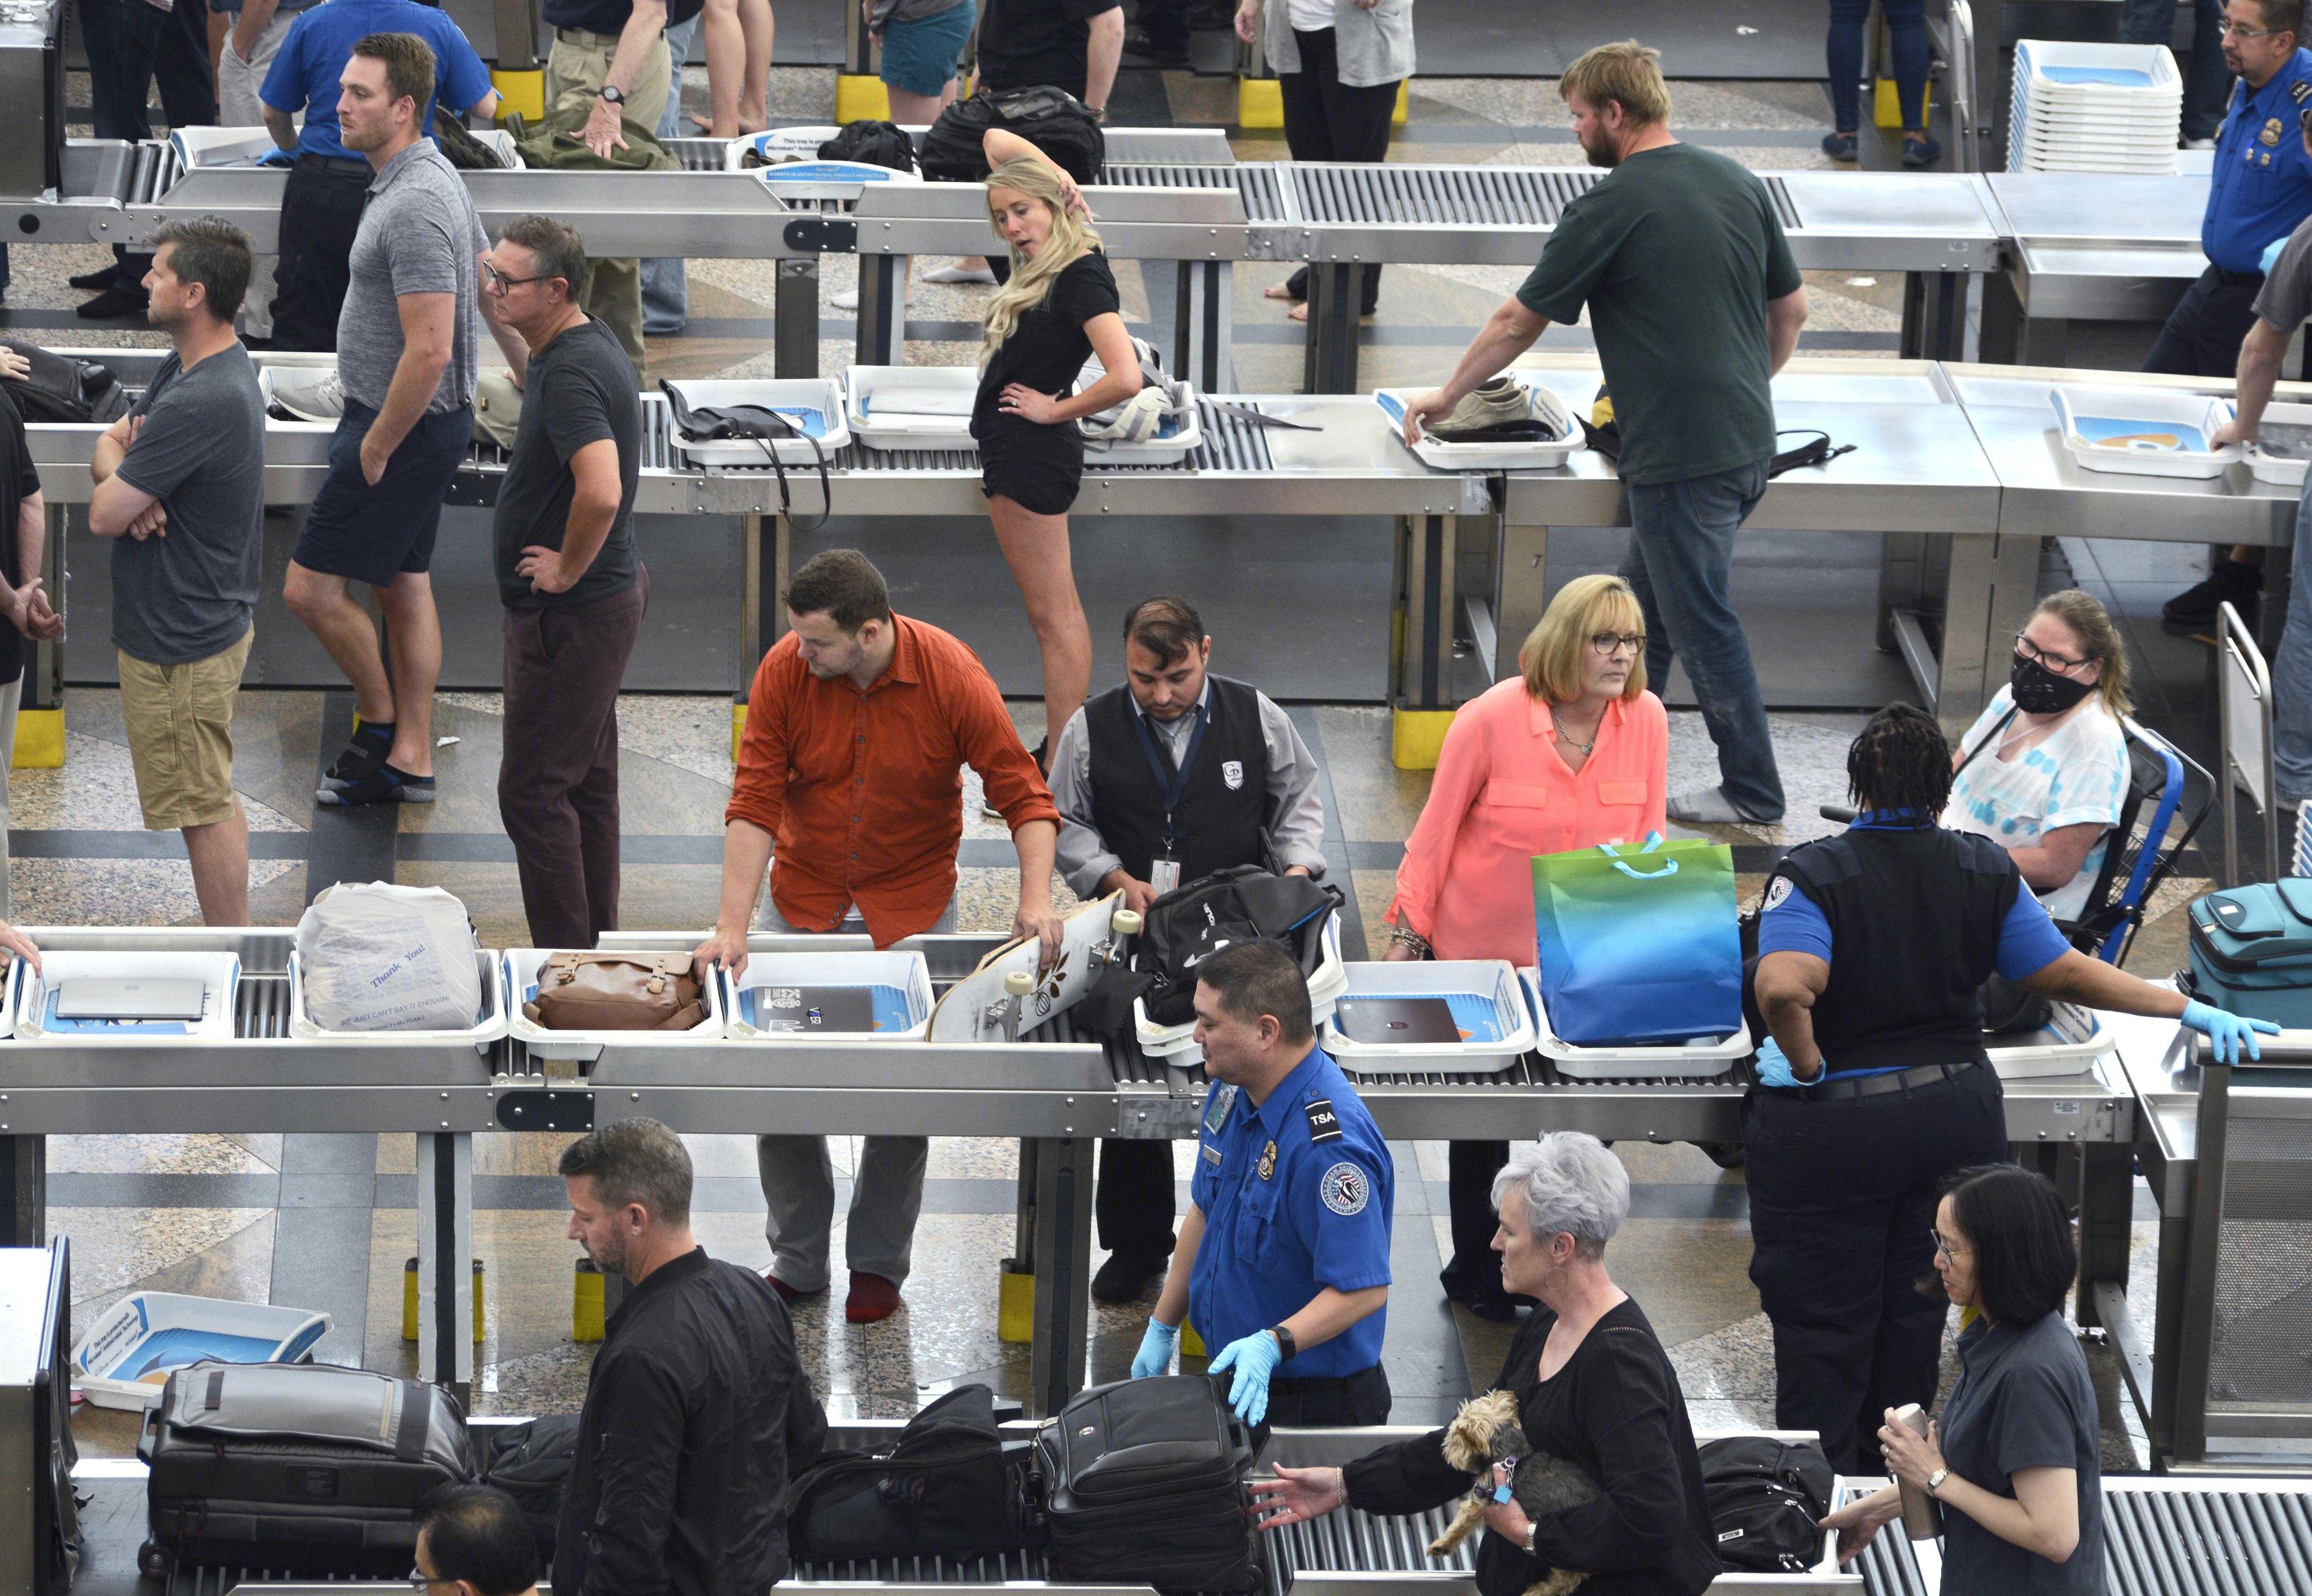 Denver International Airport scenes